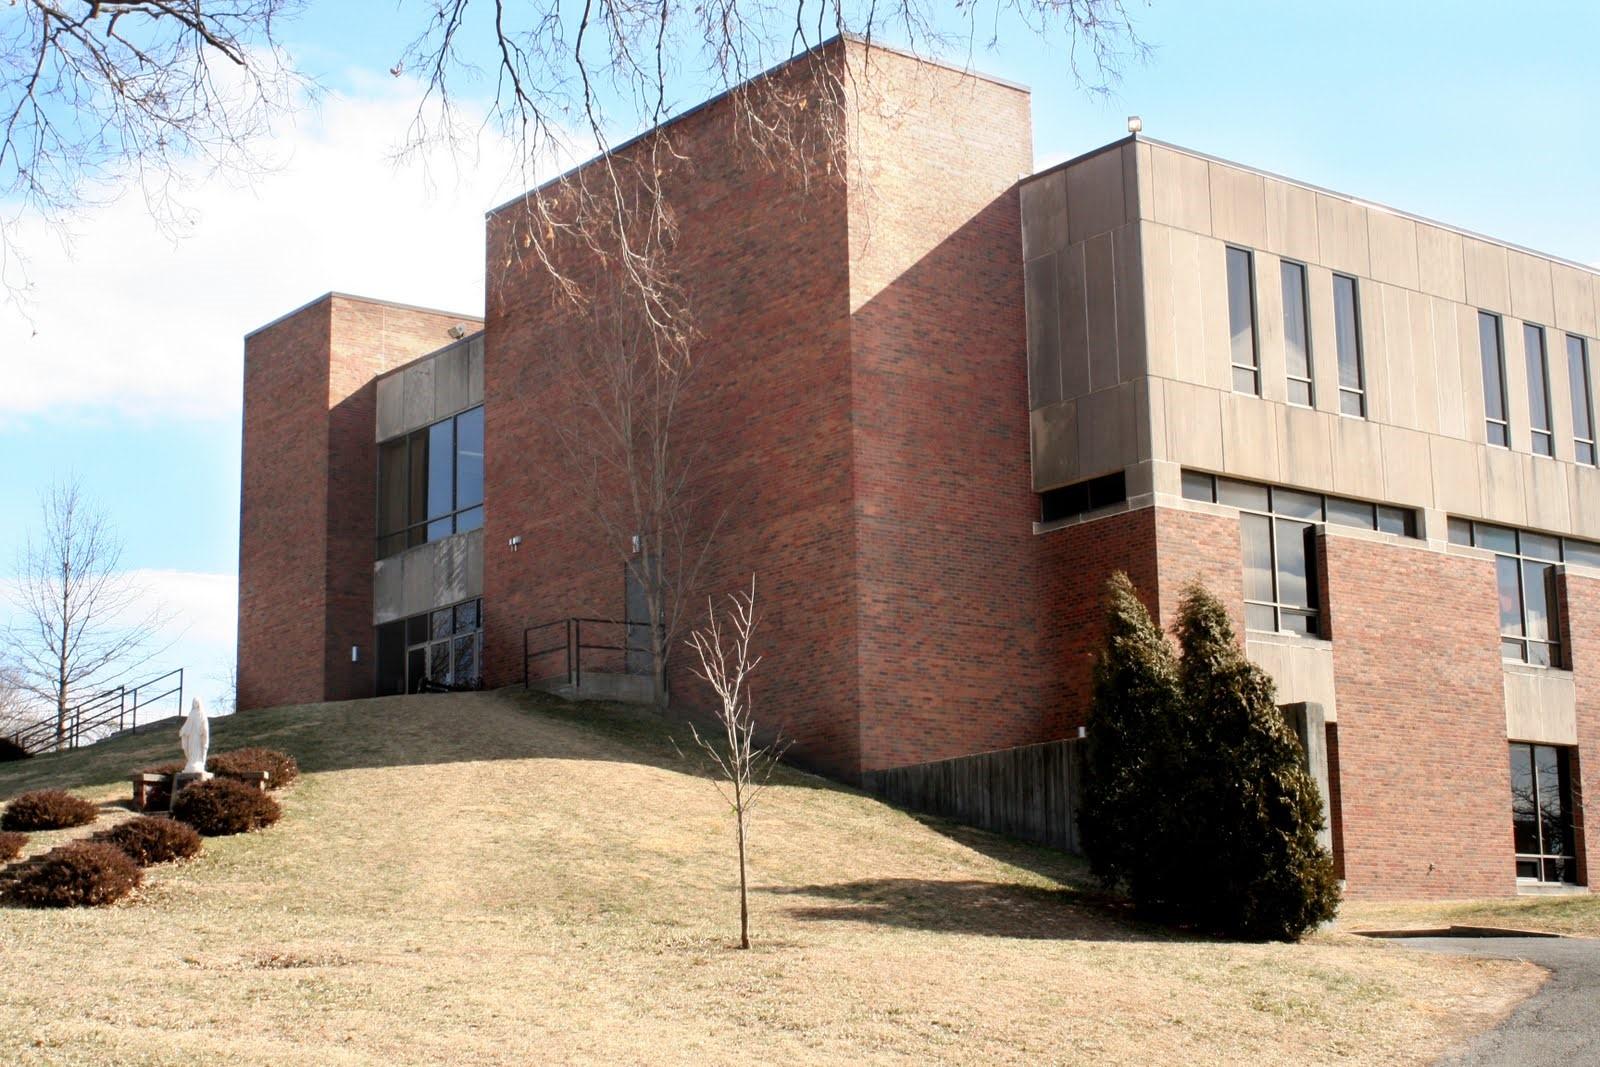 Back view of Benedictine University Library